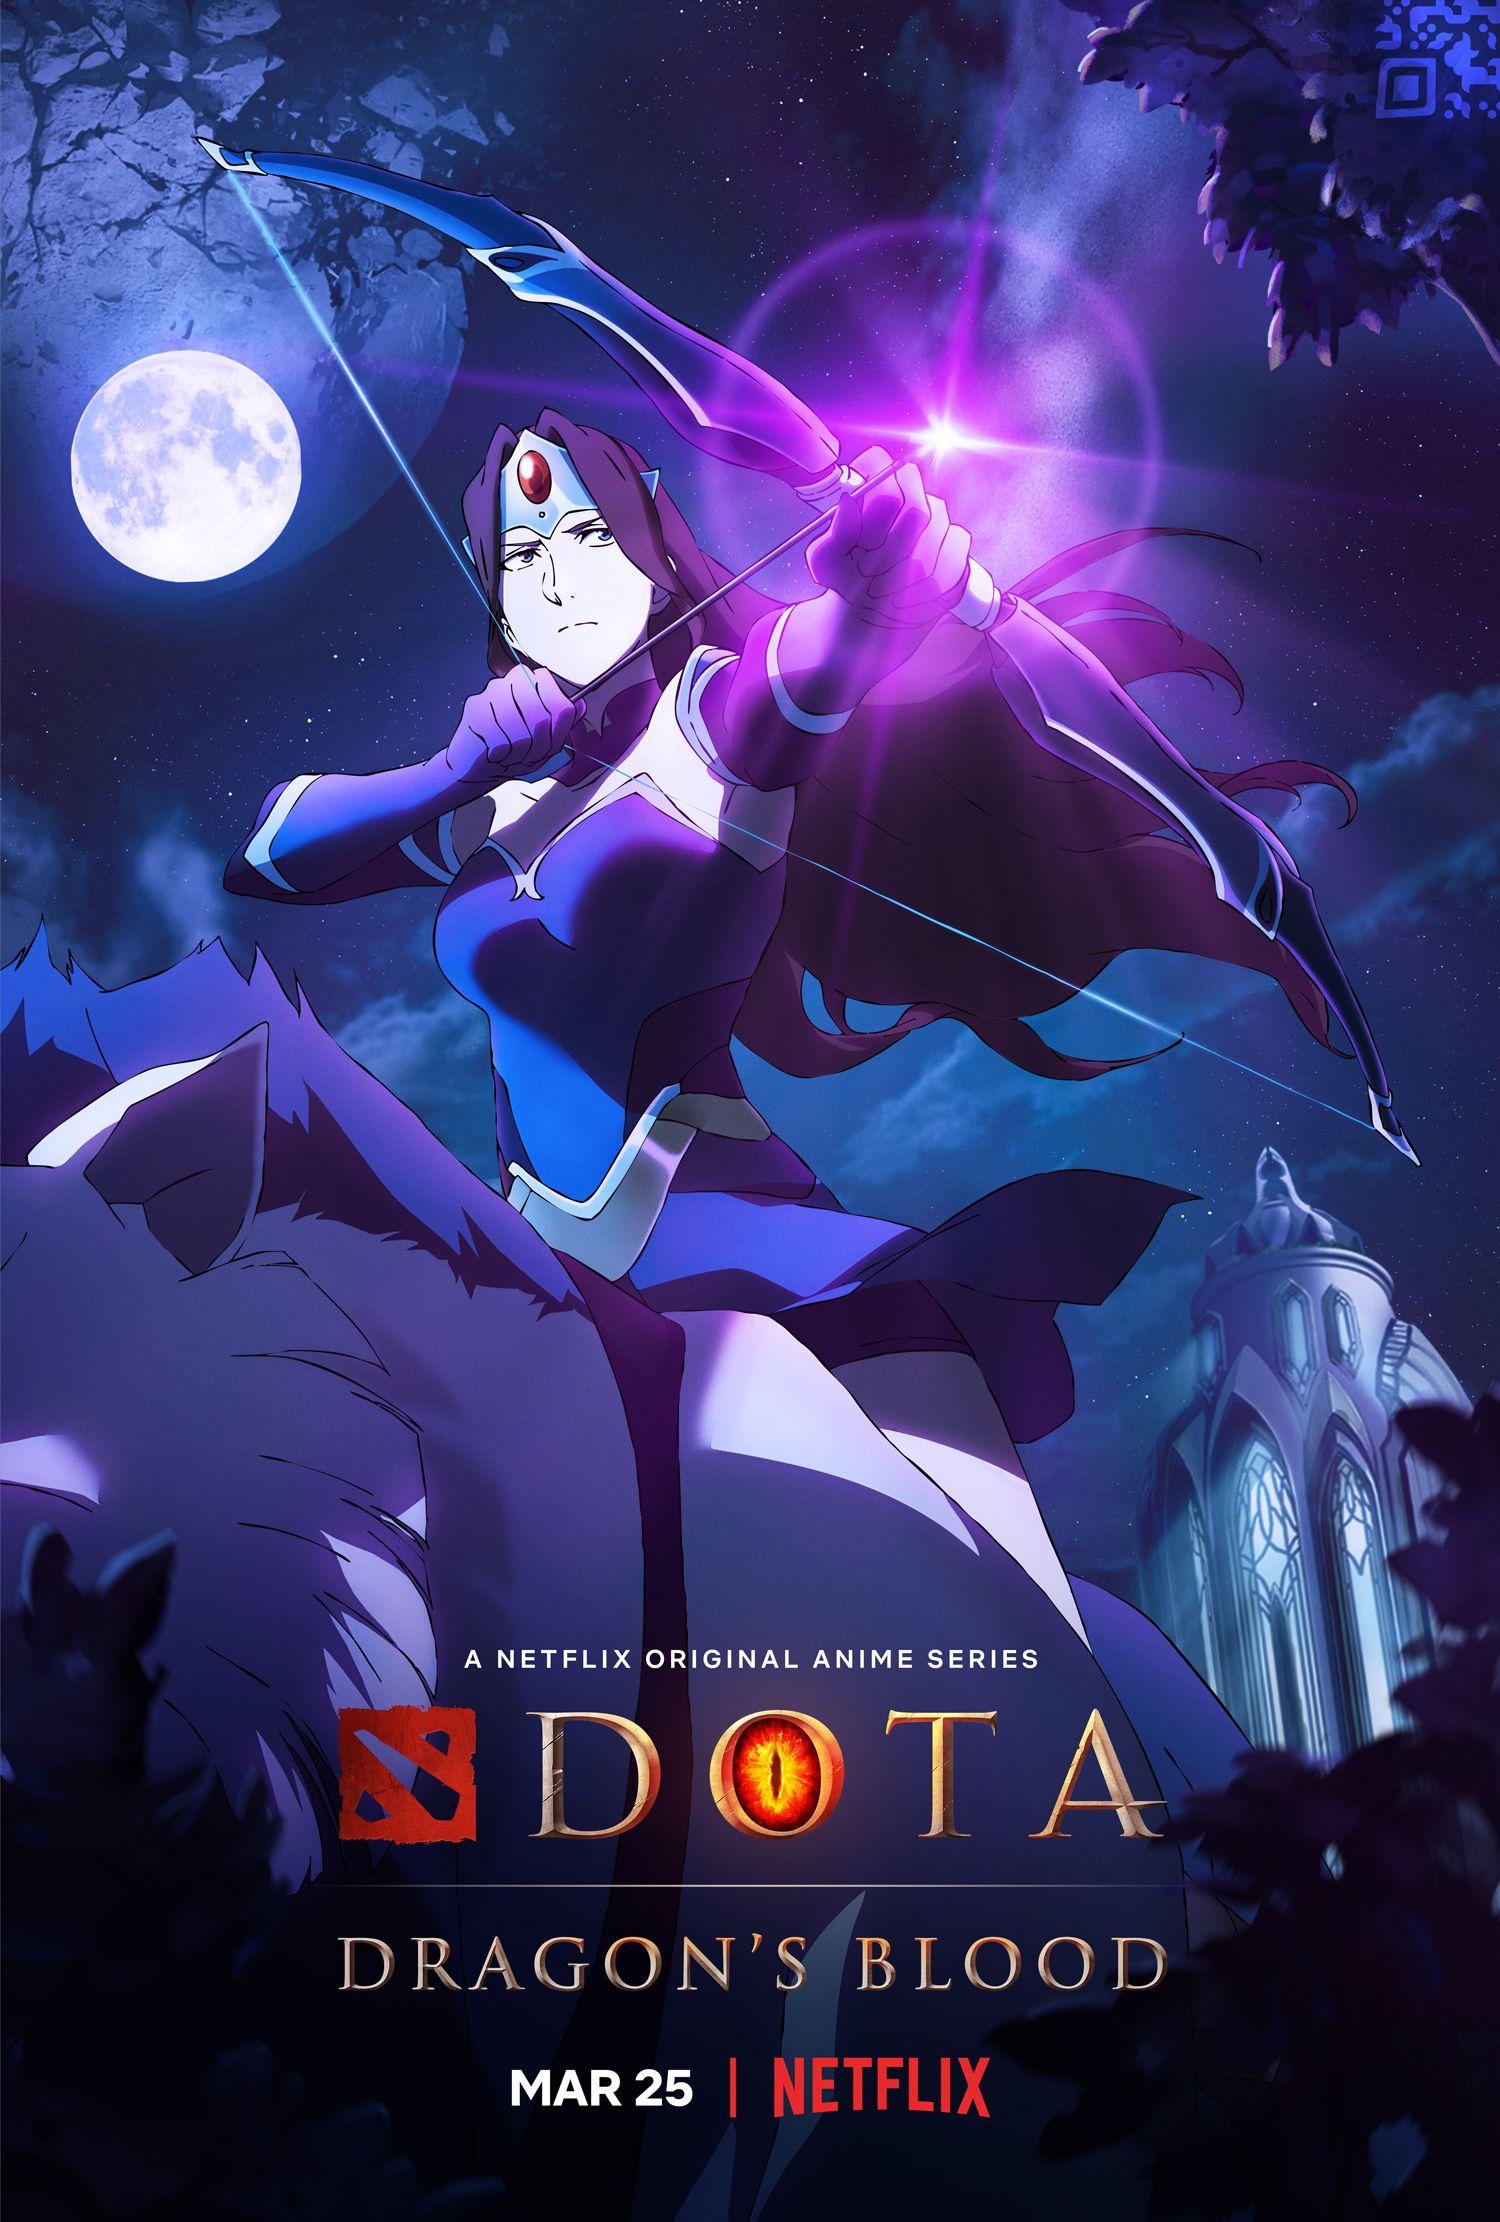 DOTA: Primeiro trailer e pôsteres de Dragon's Blood Drops para a série de anime do Netflix 2